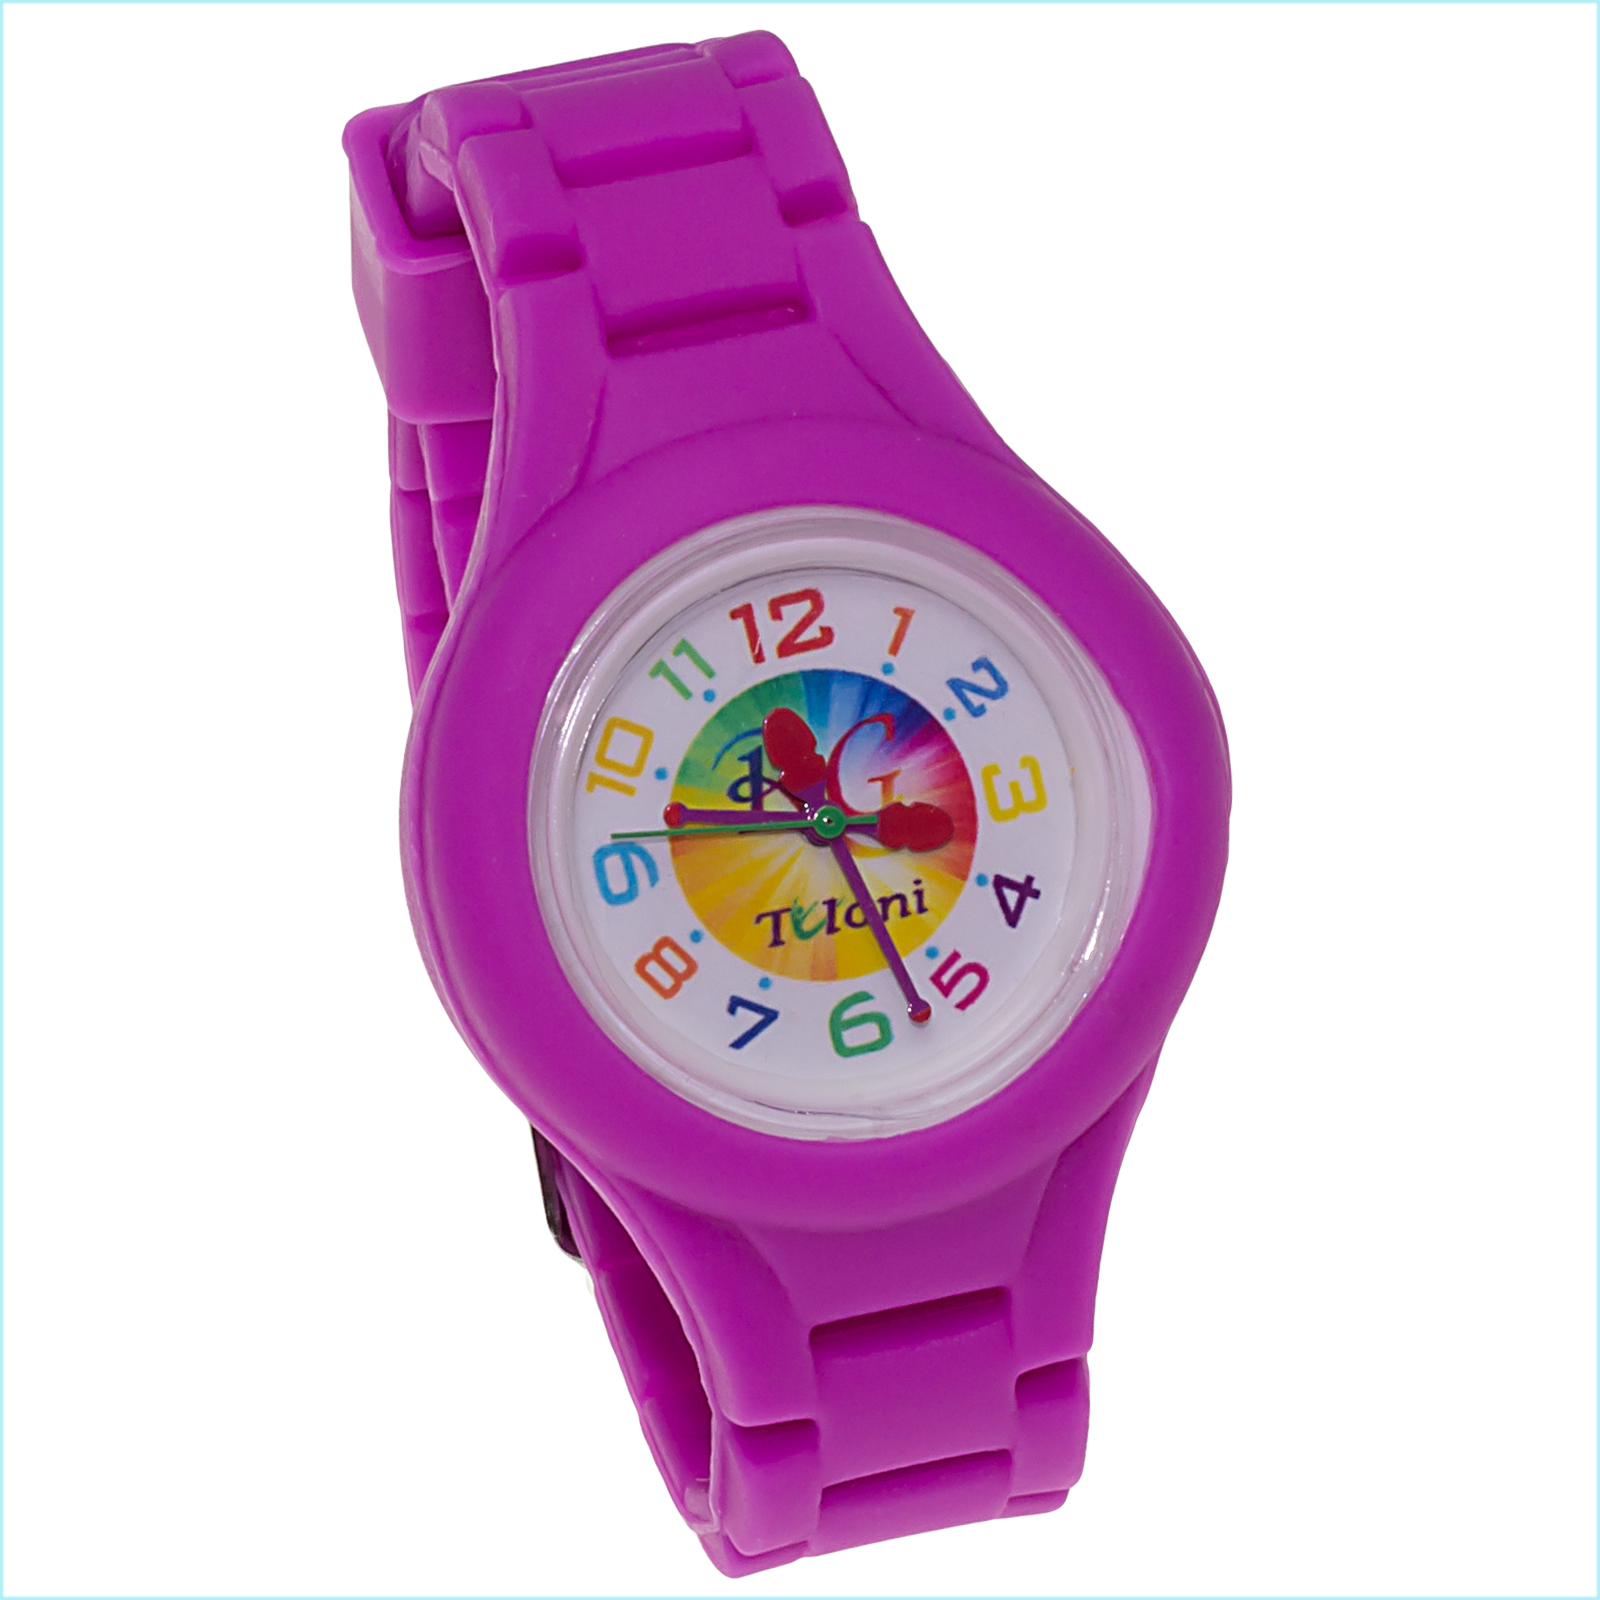 Часы Tuloni модель#3 ремешок#2 цвет Фуксия Артикул T0203-2Fu